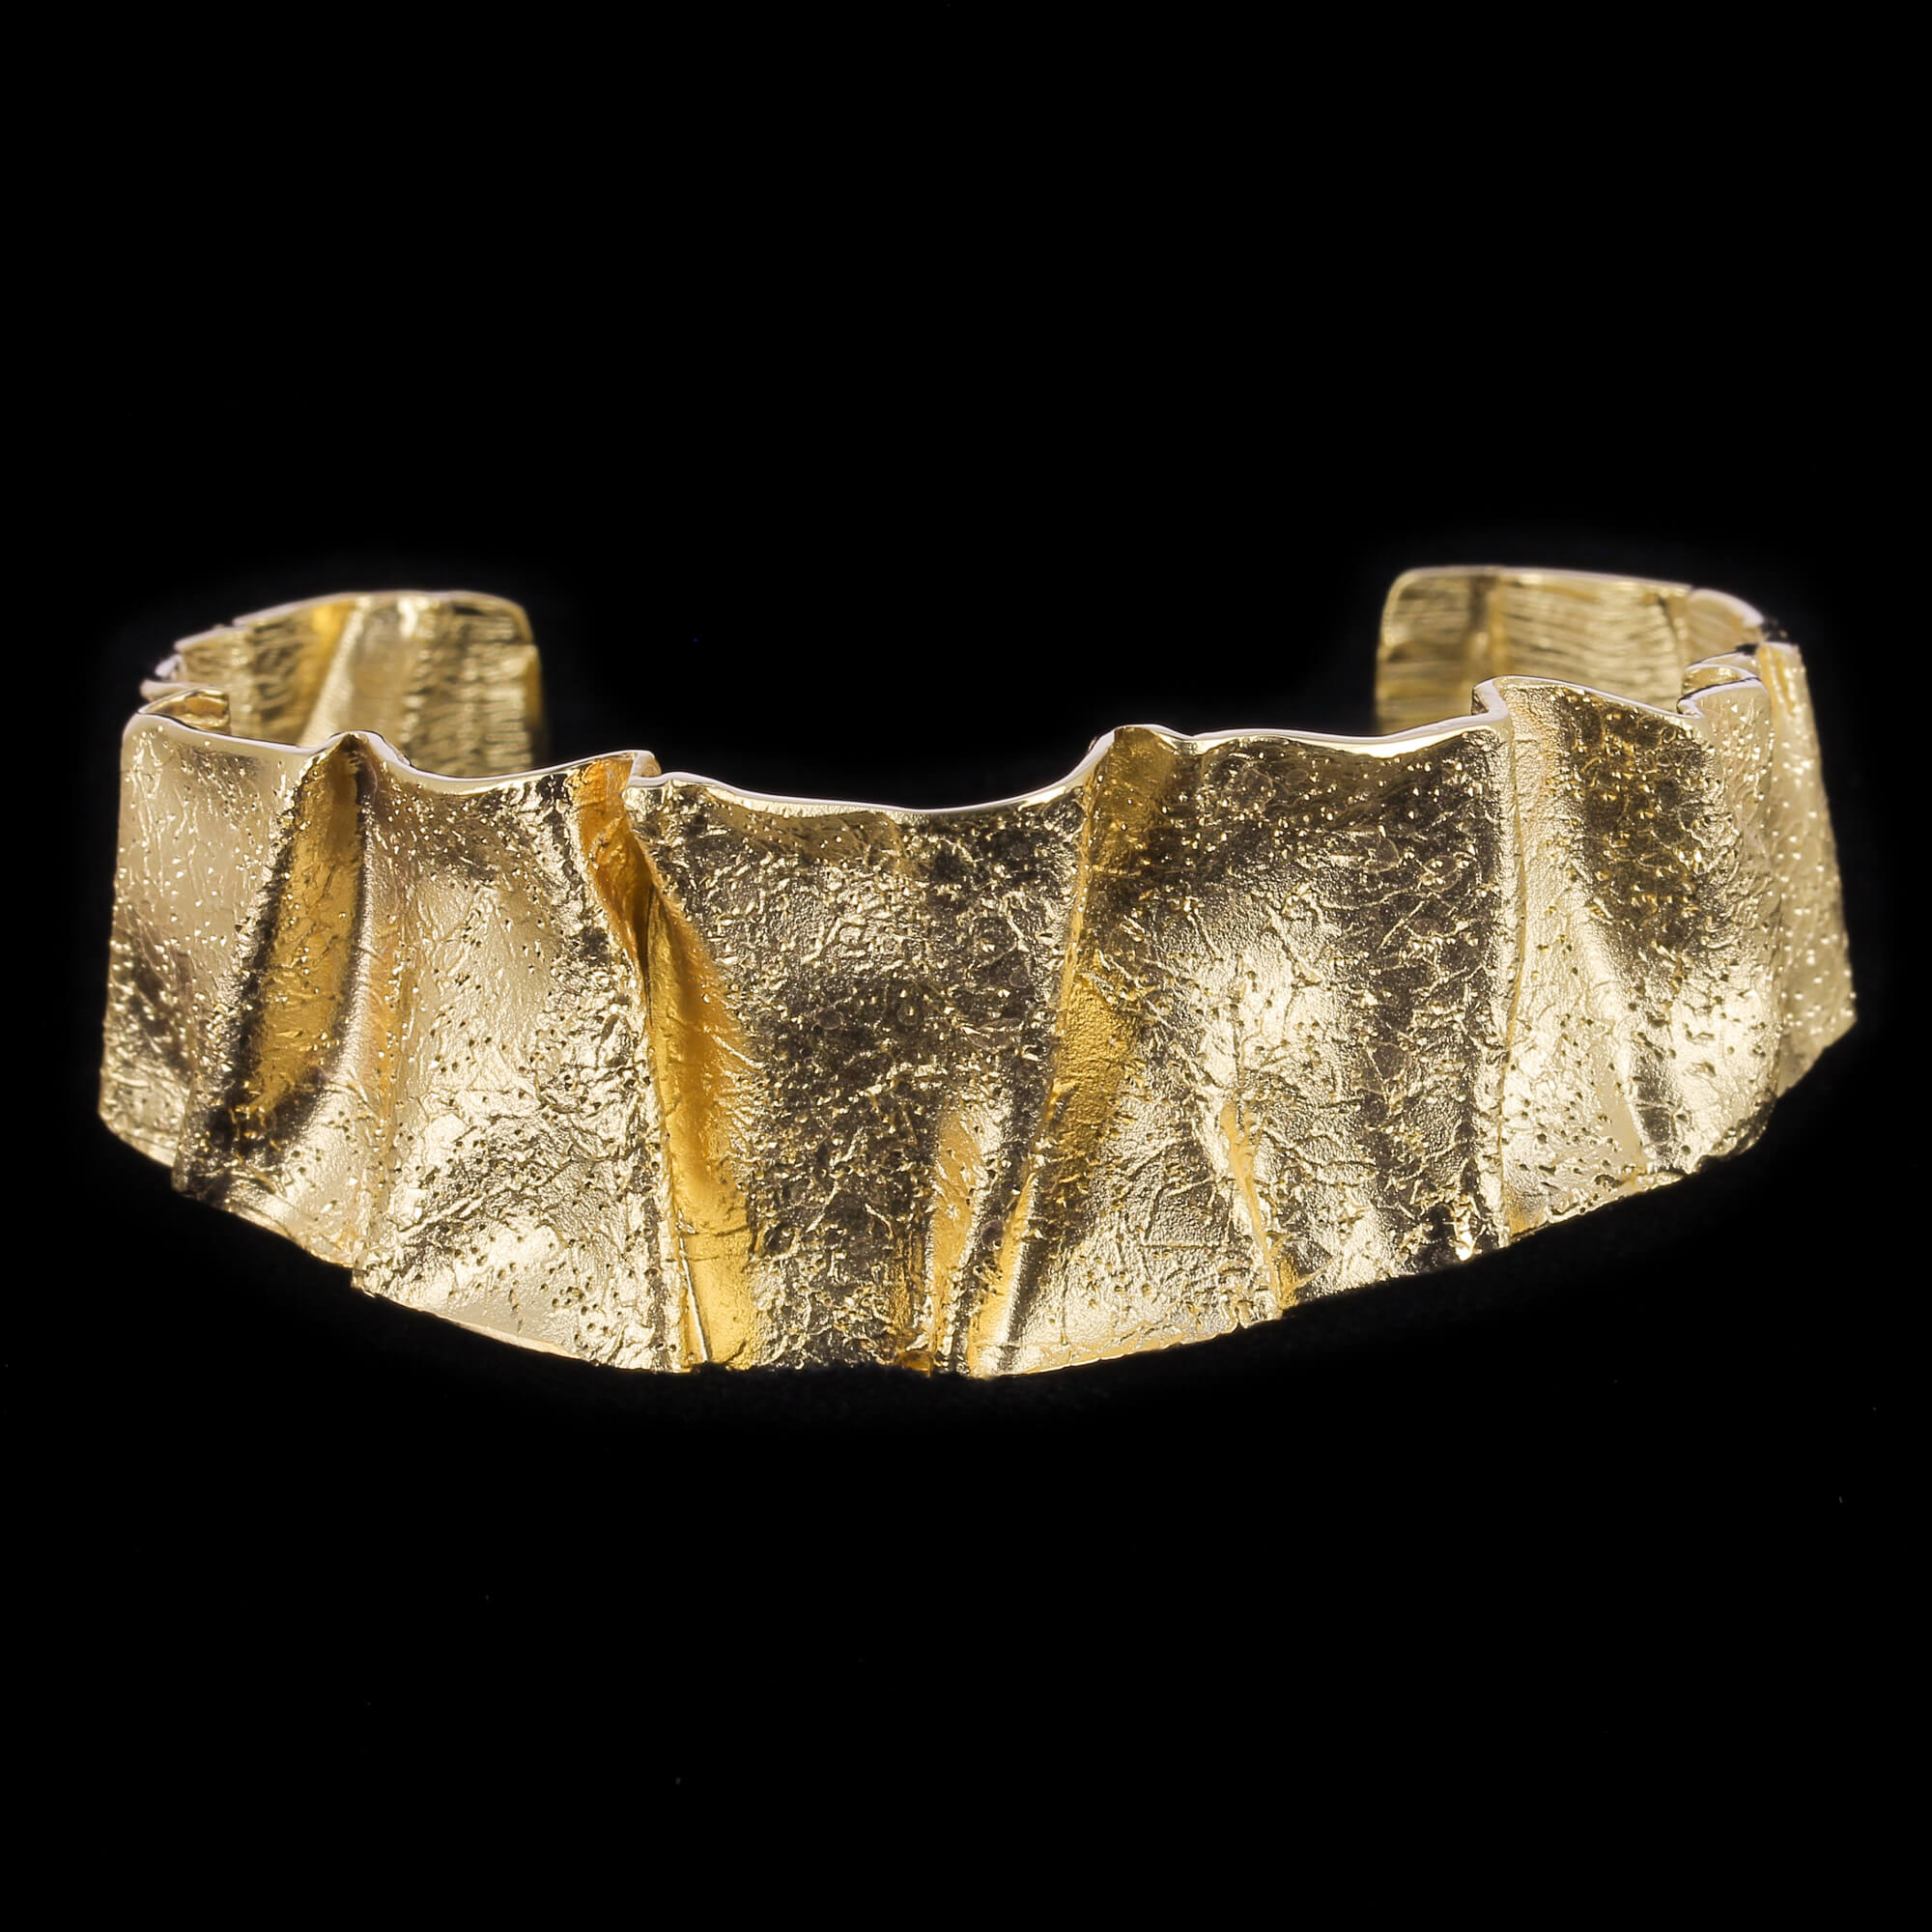 Geplooide slavenarmband van gediamanteerd zilver verguld